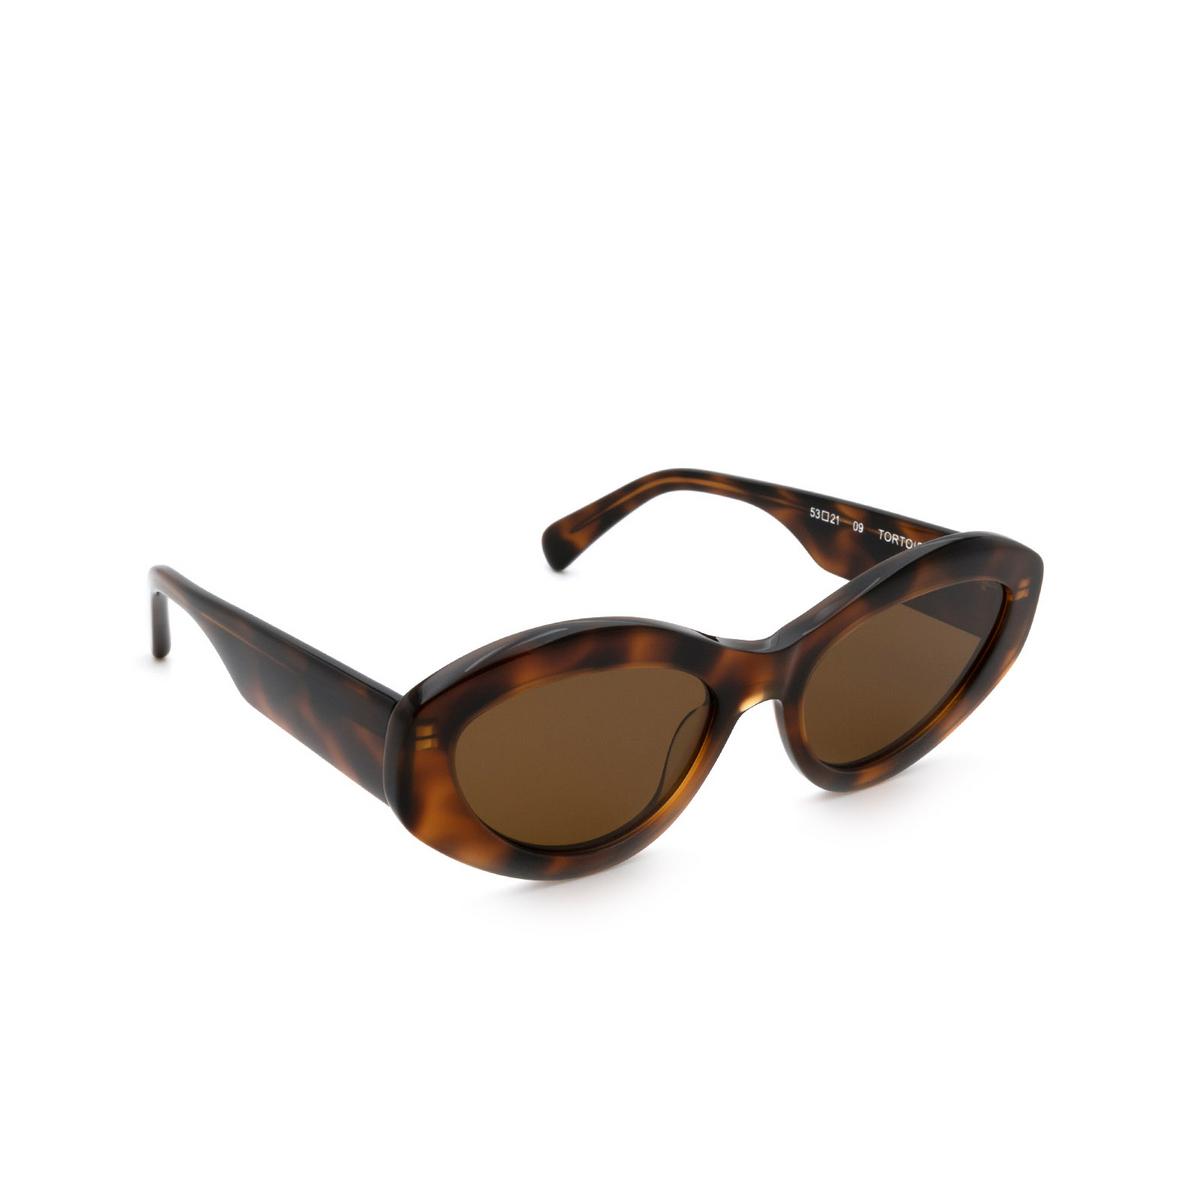 Chimi® Cat-eye Sunglasses: 09 color Tortoise - three-quarters view.